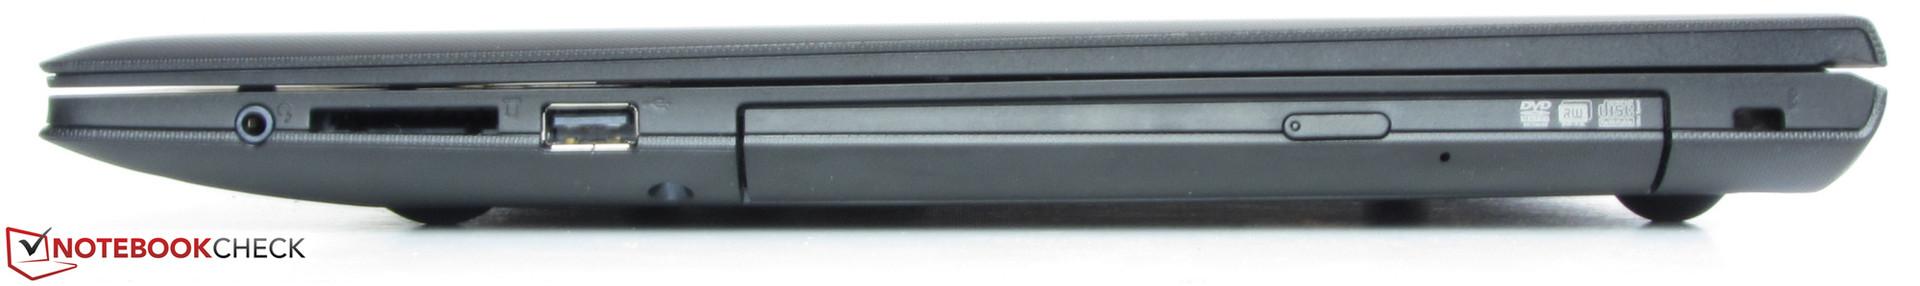 Review Lenovo G500s-59367693 Notebook - NotebookCheck net Reviews